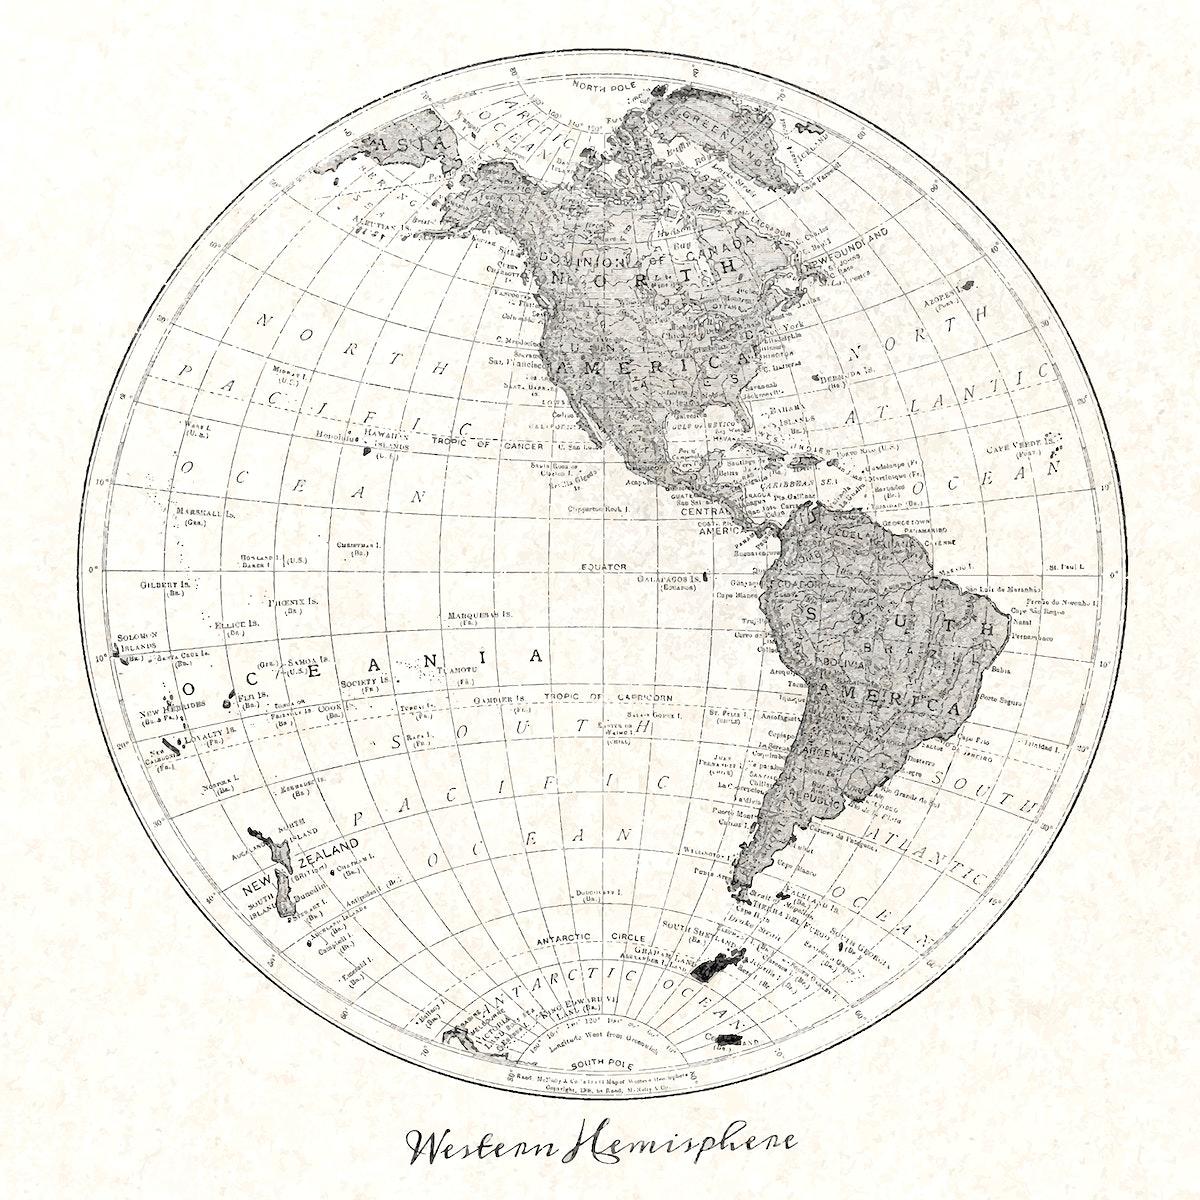 Western Hemisphere map vintage illustration vector, remix from original artwork.